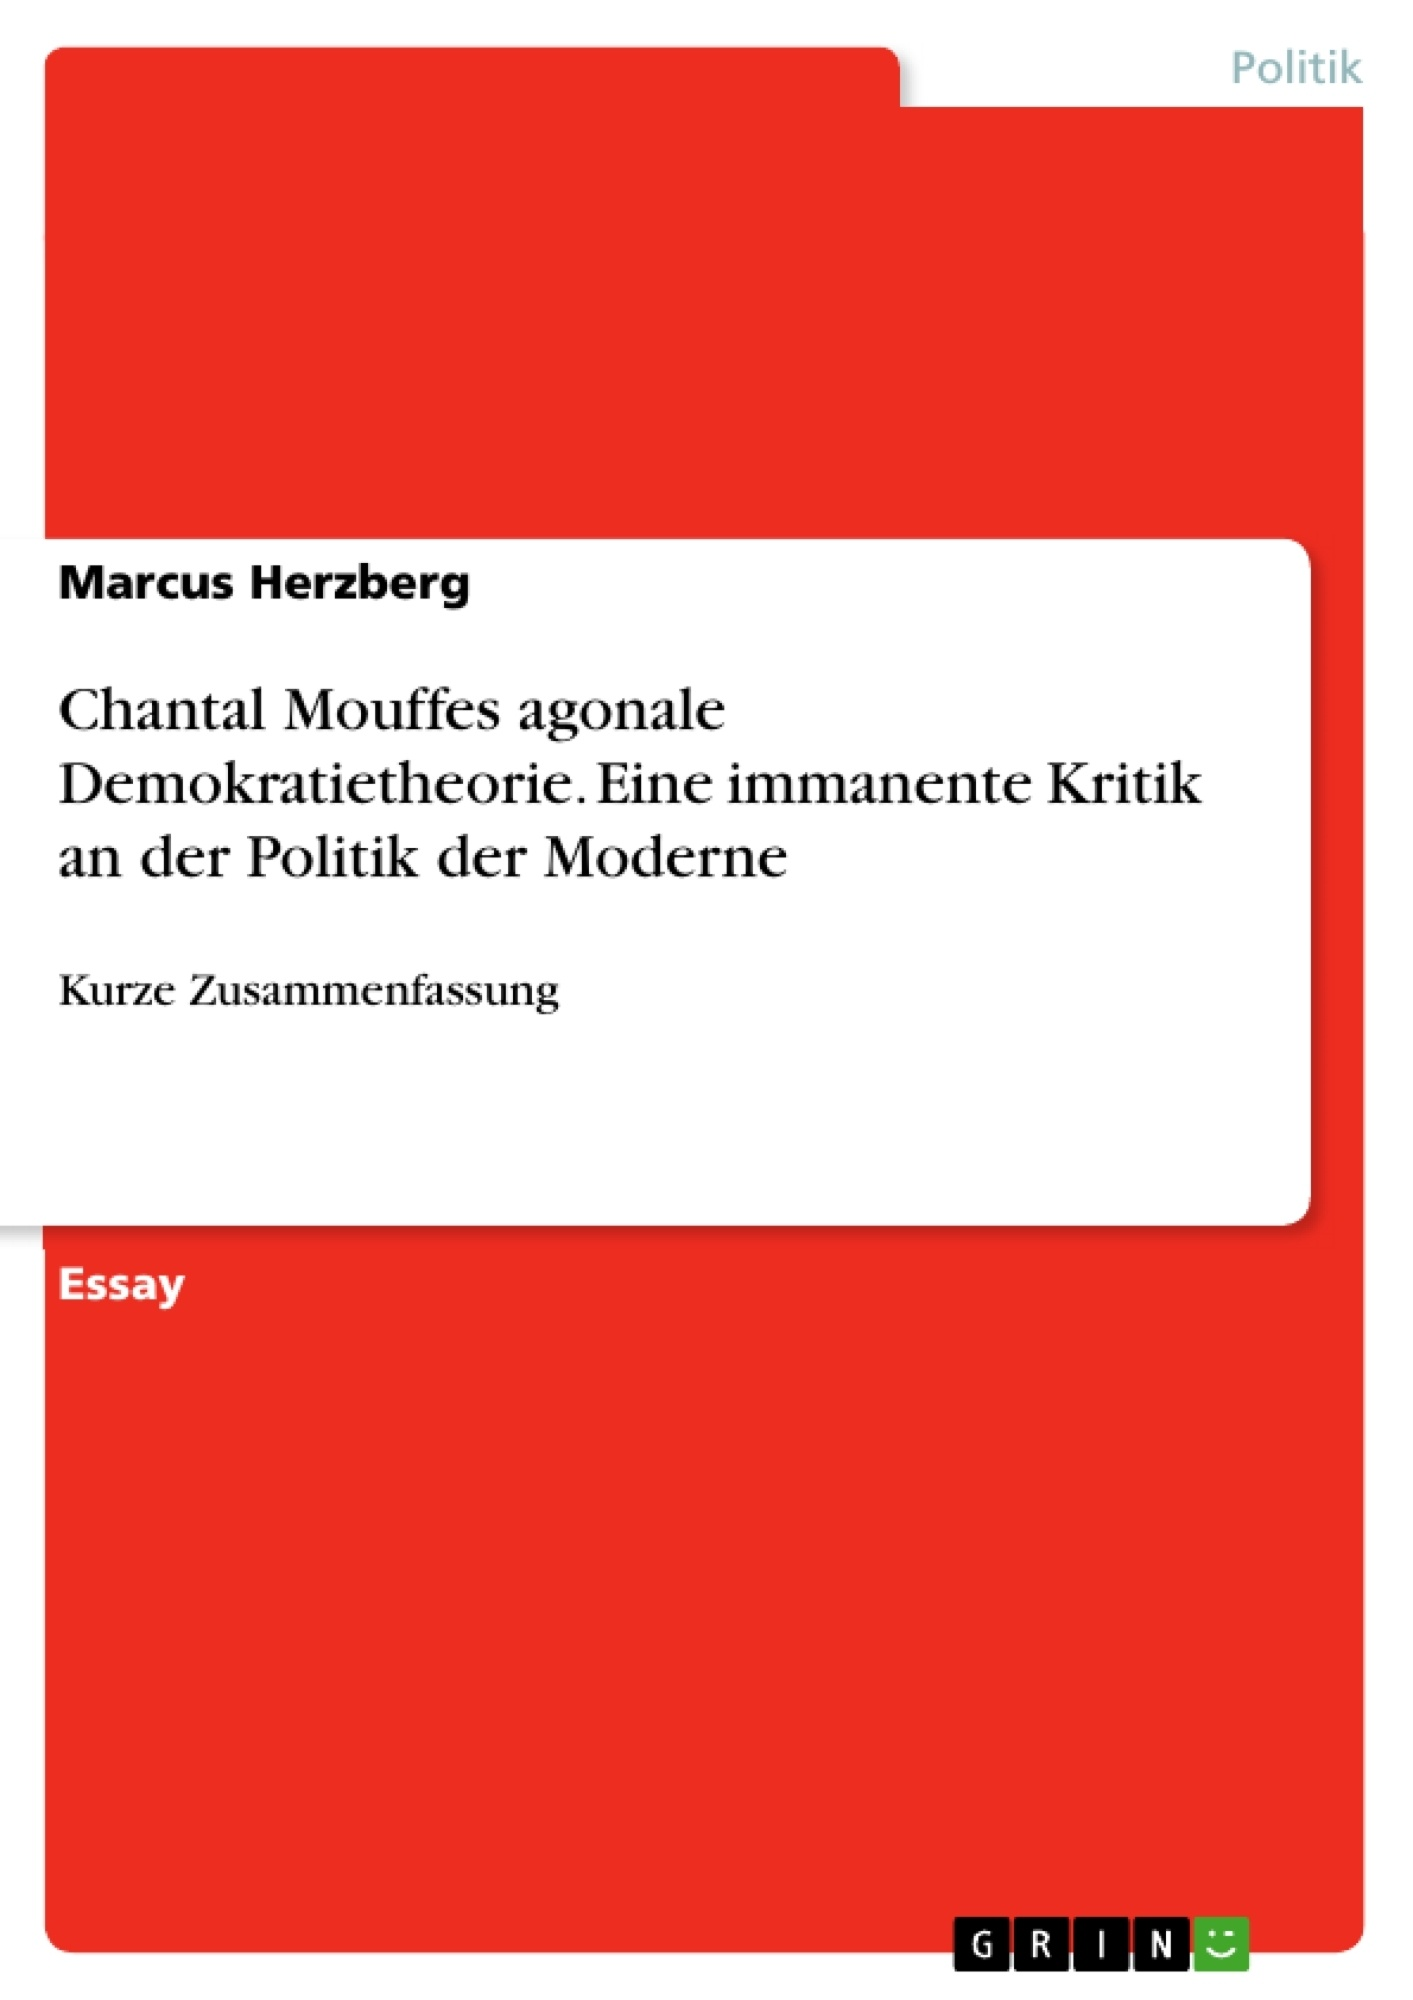 Titel: Chantal Mouffes agonale Demokratietheorie. Eine immanente Kritik an der Politik der Moderne